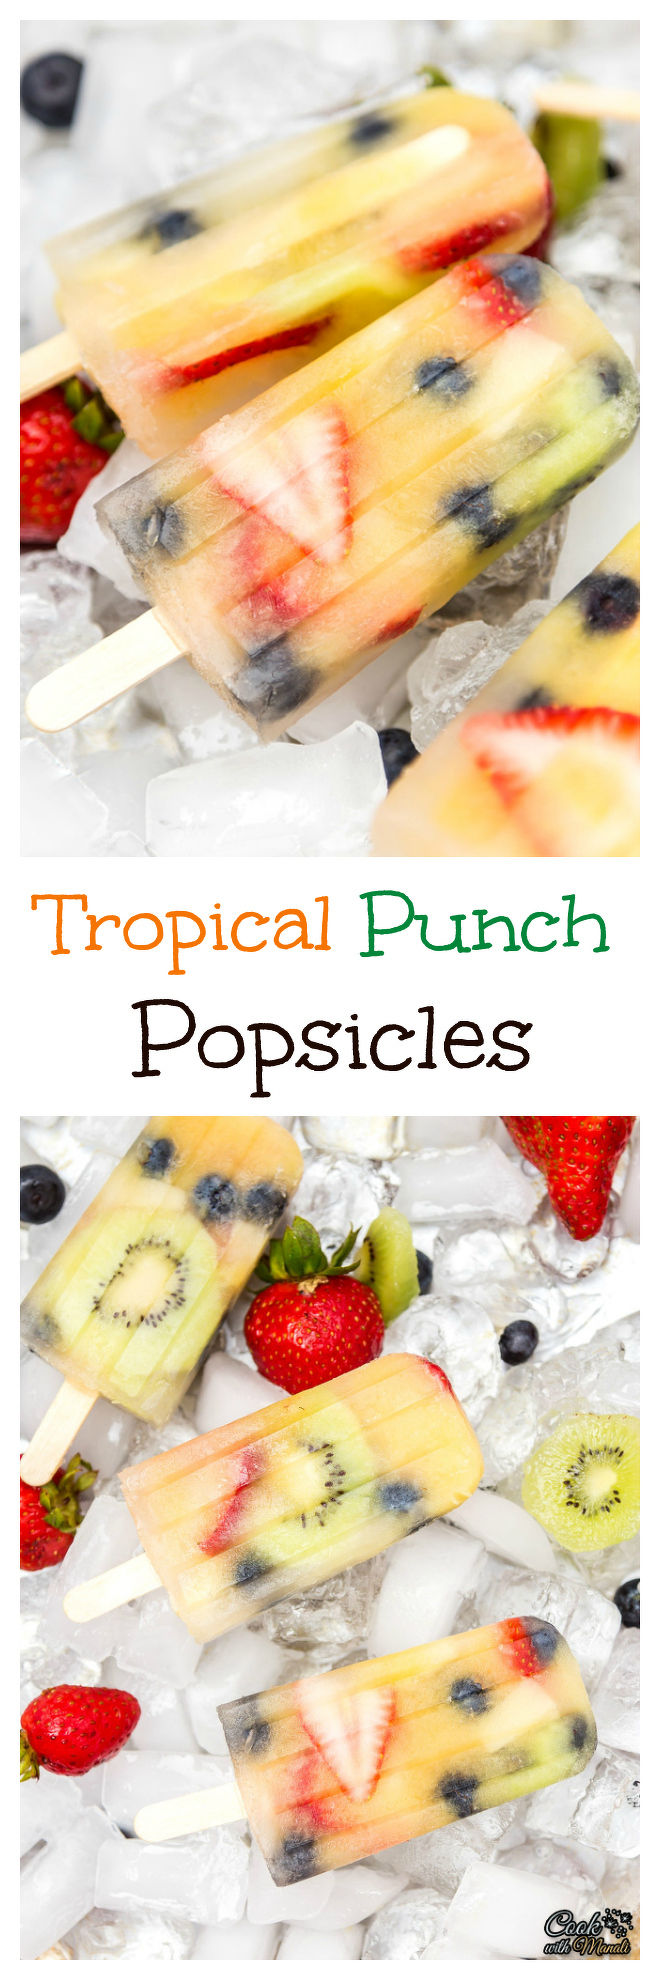 Tropical Punch Popsicles Collage-nocwm